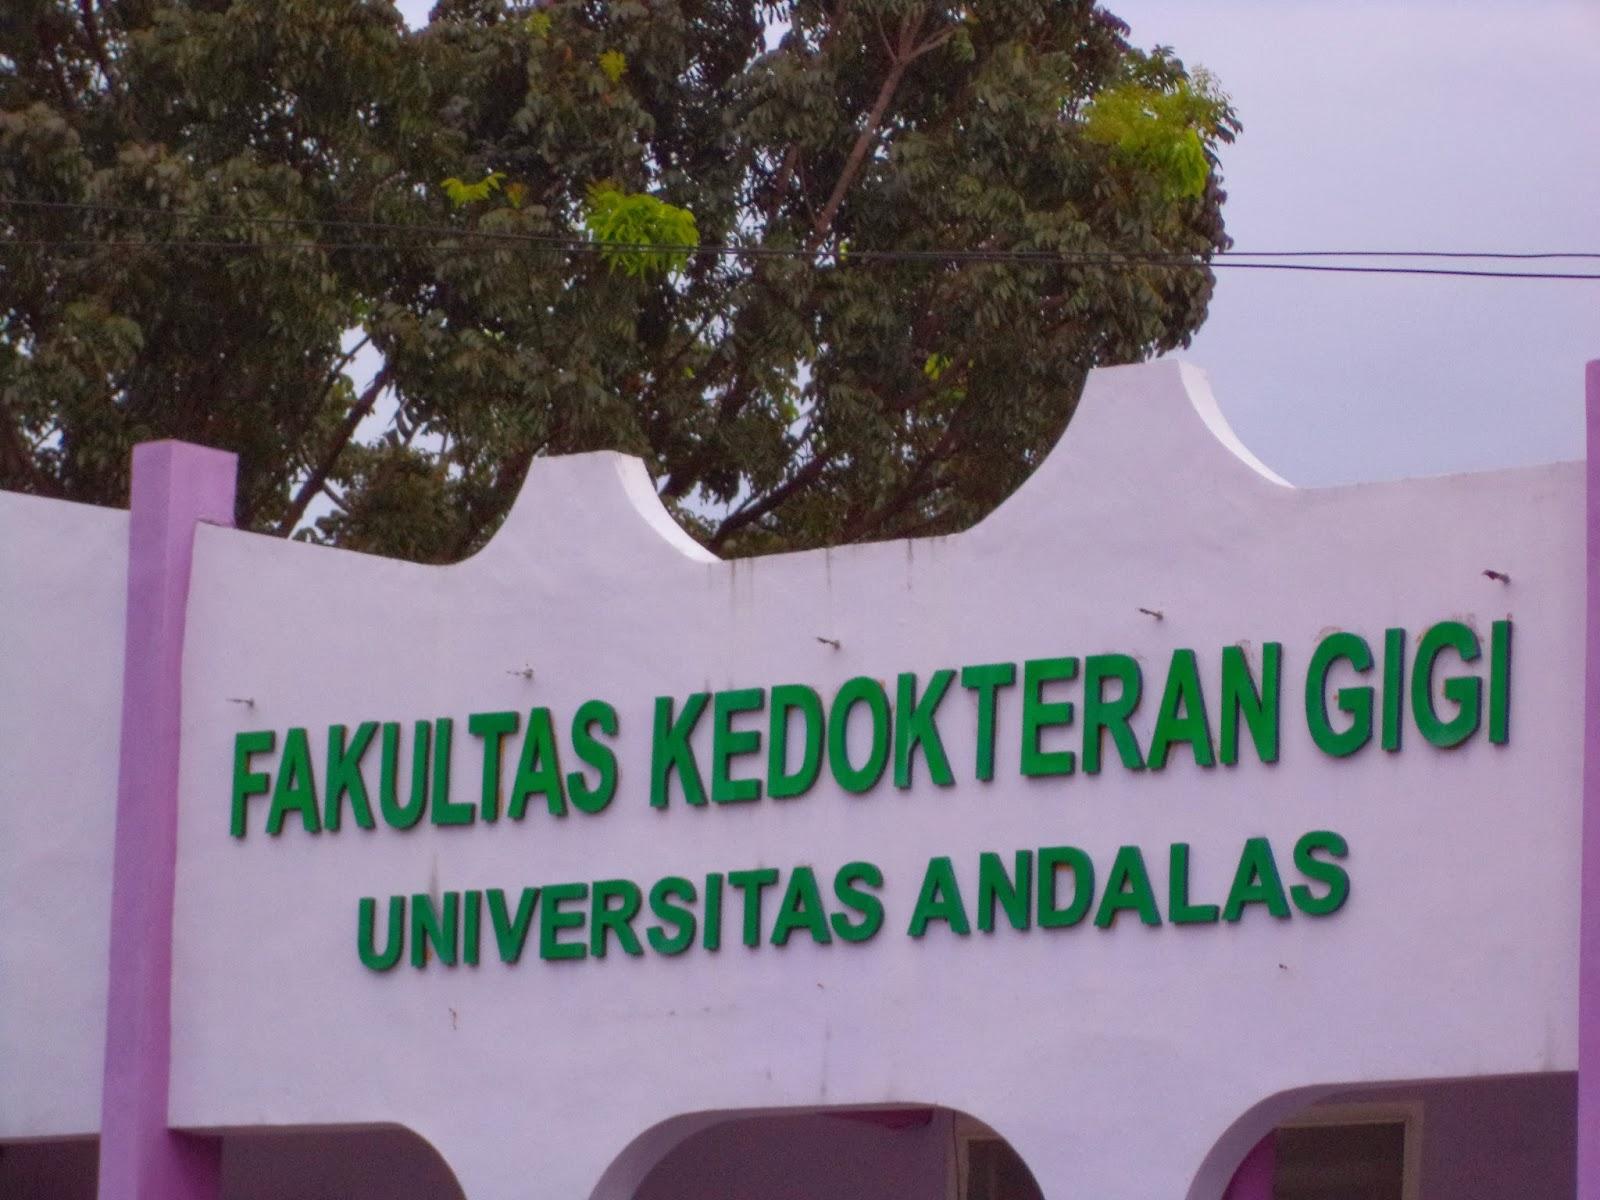 Fakultas Kedokteran Gigi Universitas Andalas.